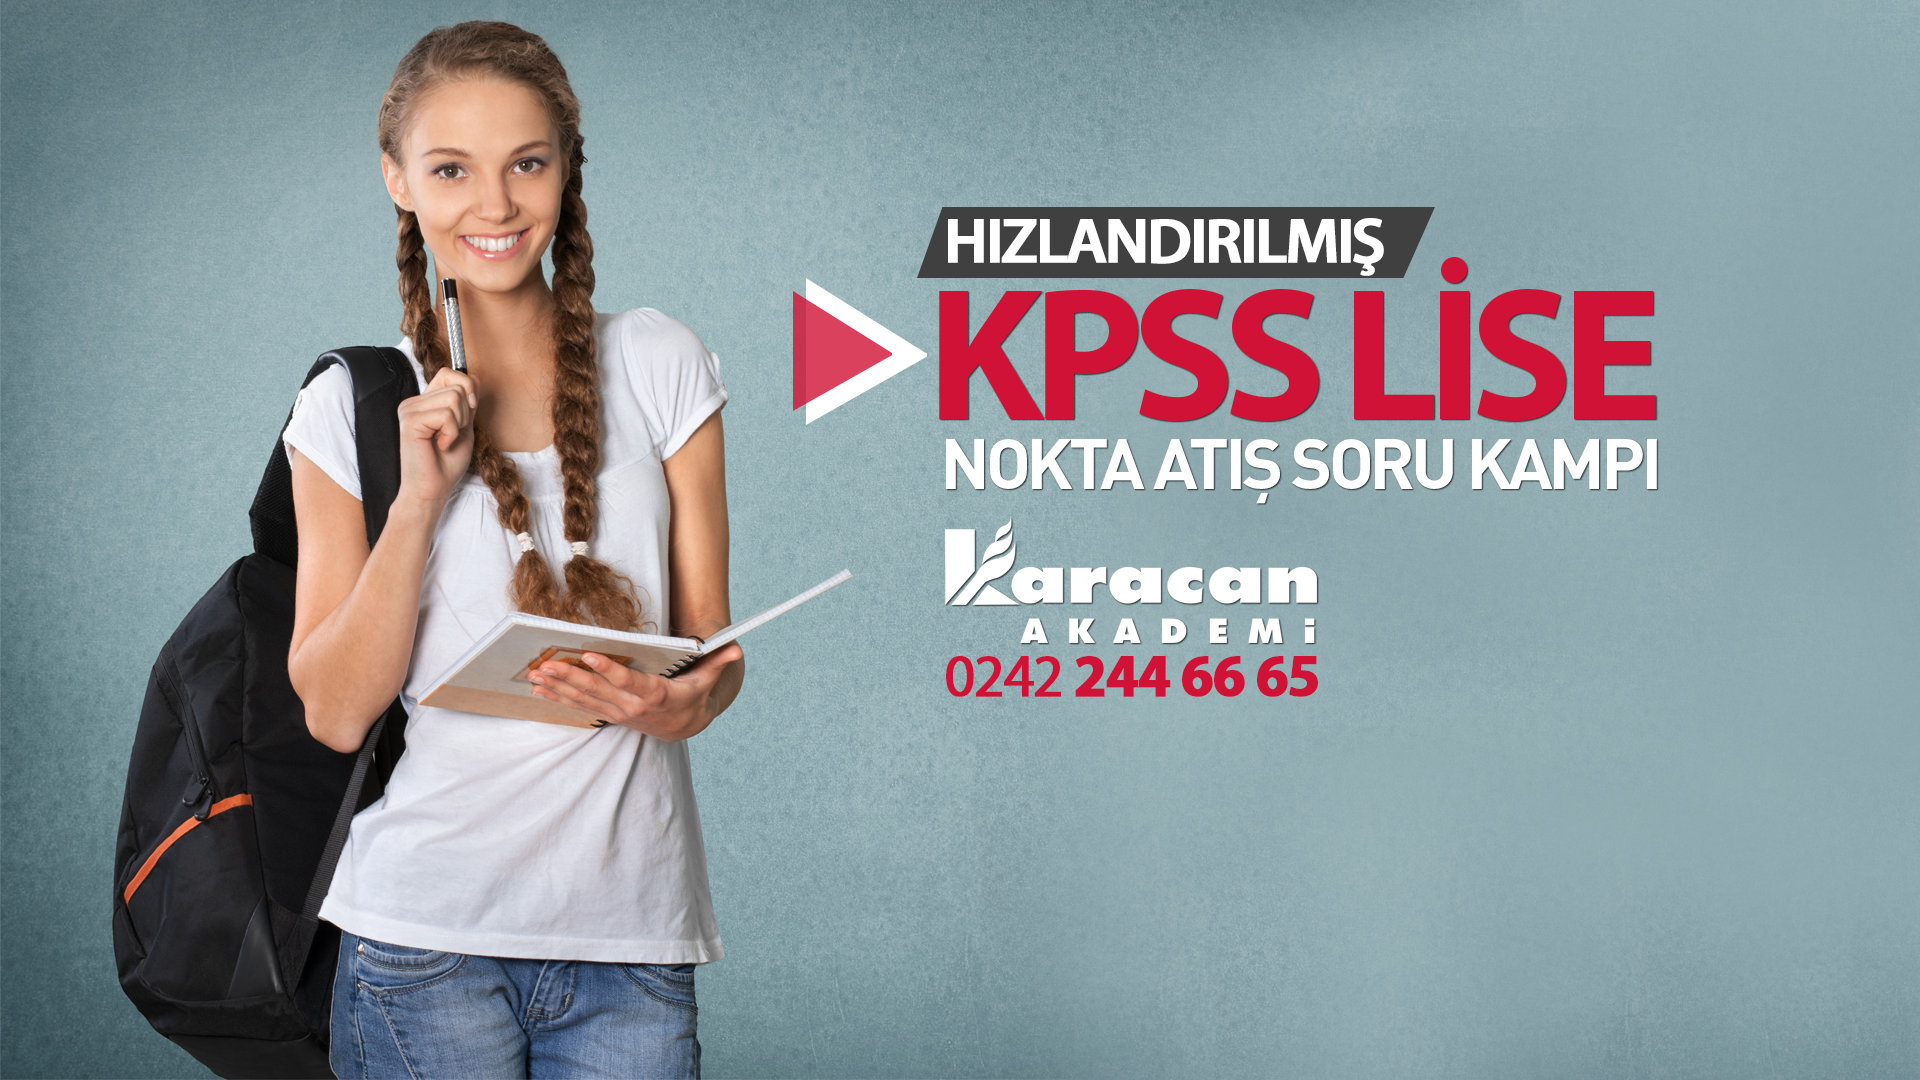 Hizlandirilmis KPSS Lise - Önlisans kurs kayitlari baslamistir.